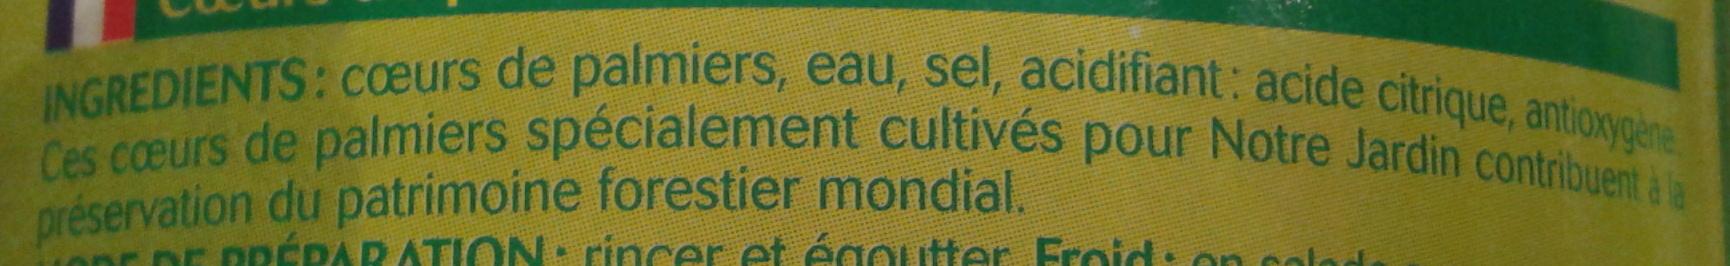 Coeurs de palmier bocal - Ingredients - fr